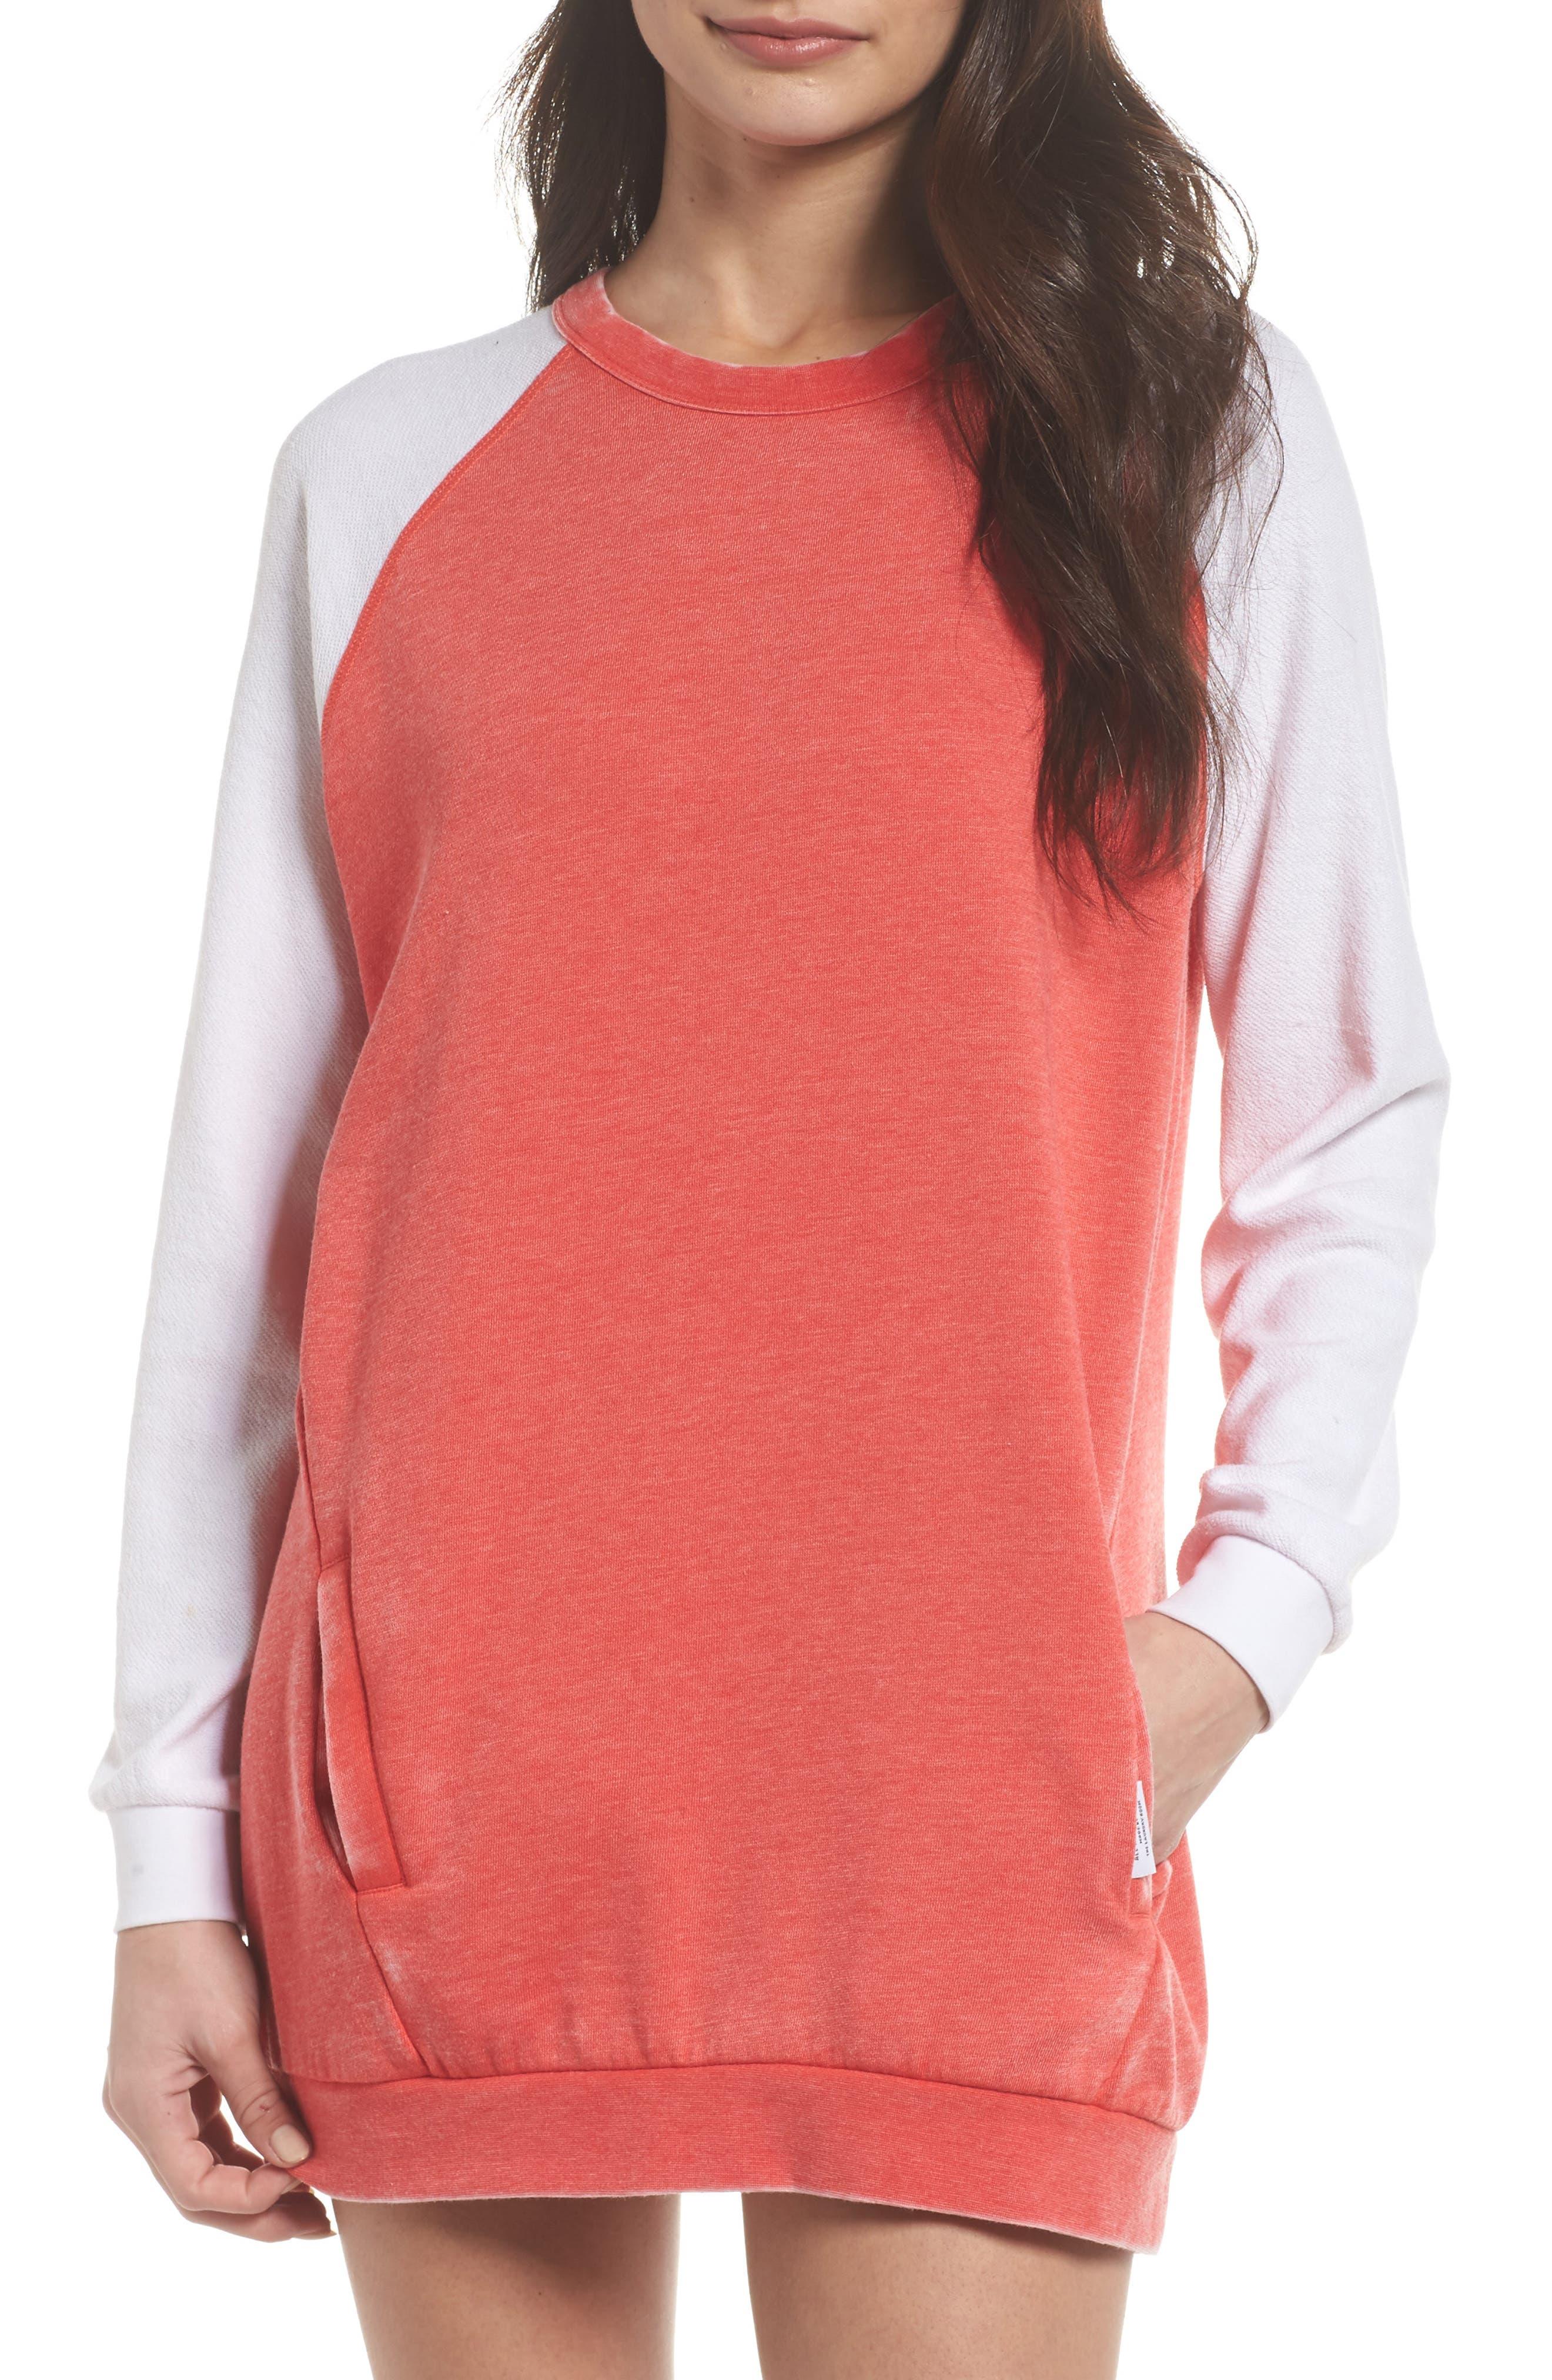 Lounge Sweatshirt Dress,                             Main thumbnail 1, color,                             Love Red/ White